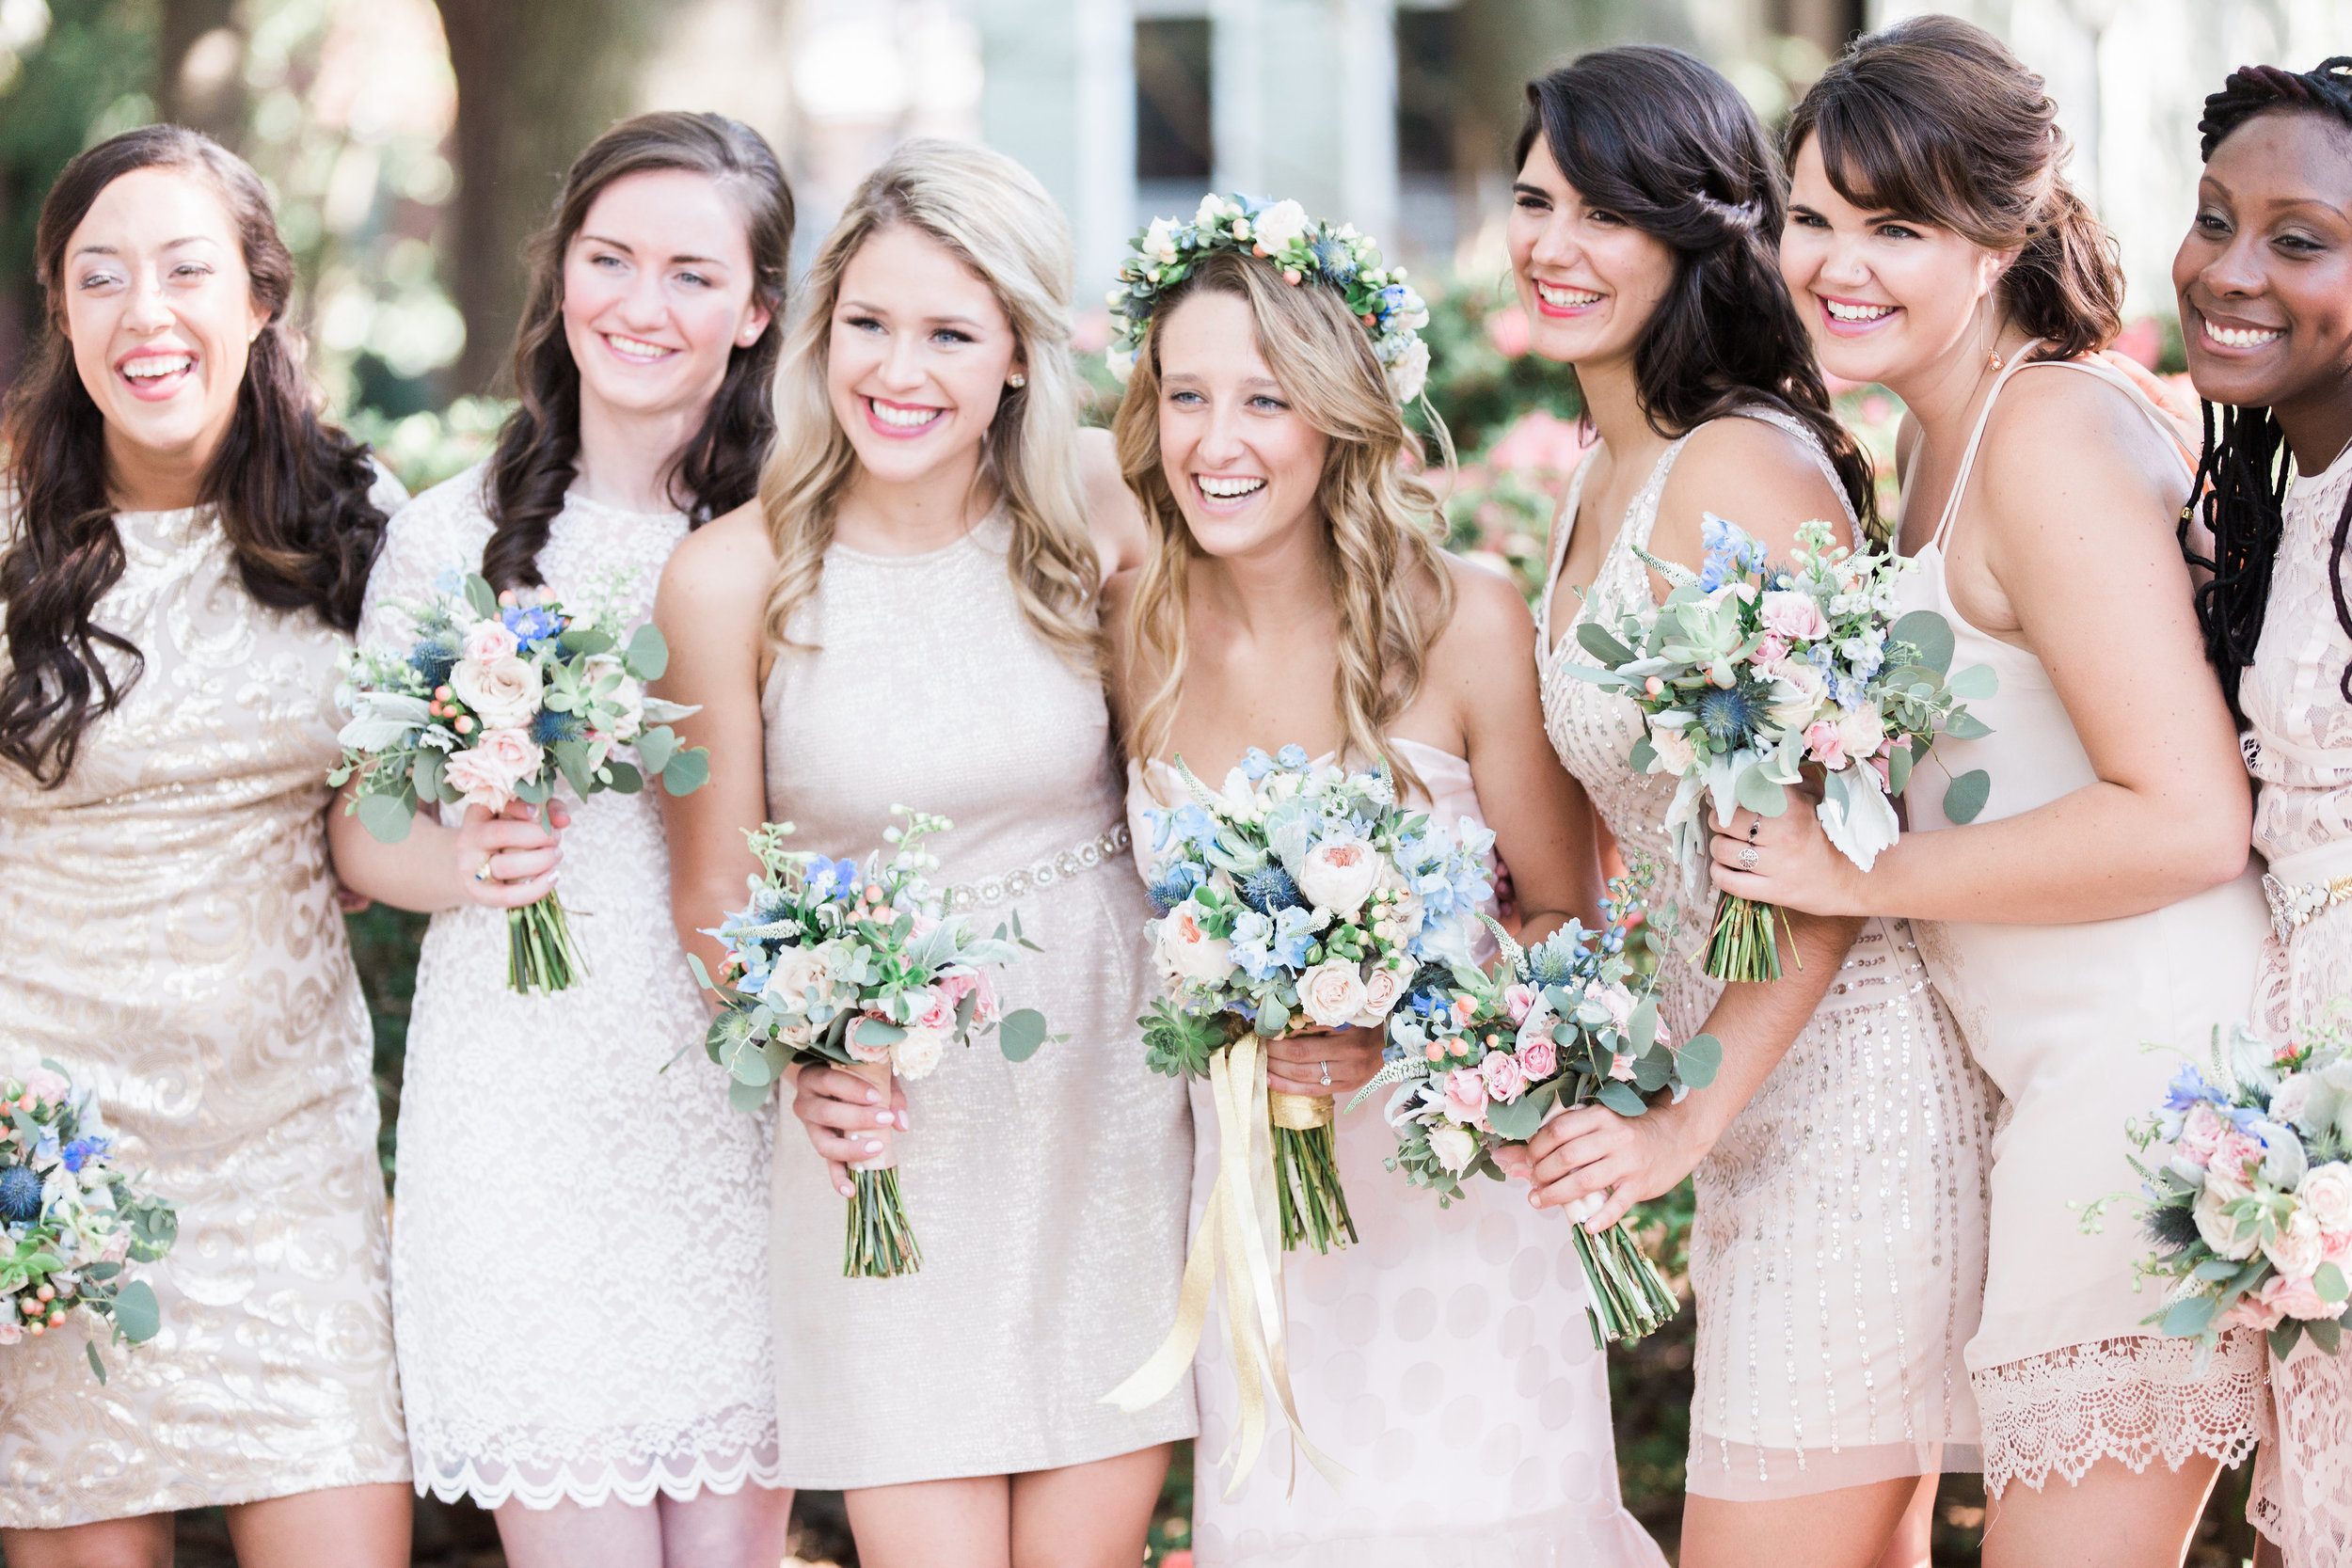 Bridesmaids wearing neutral cocktail dresses at wedding in Savannah GA